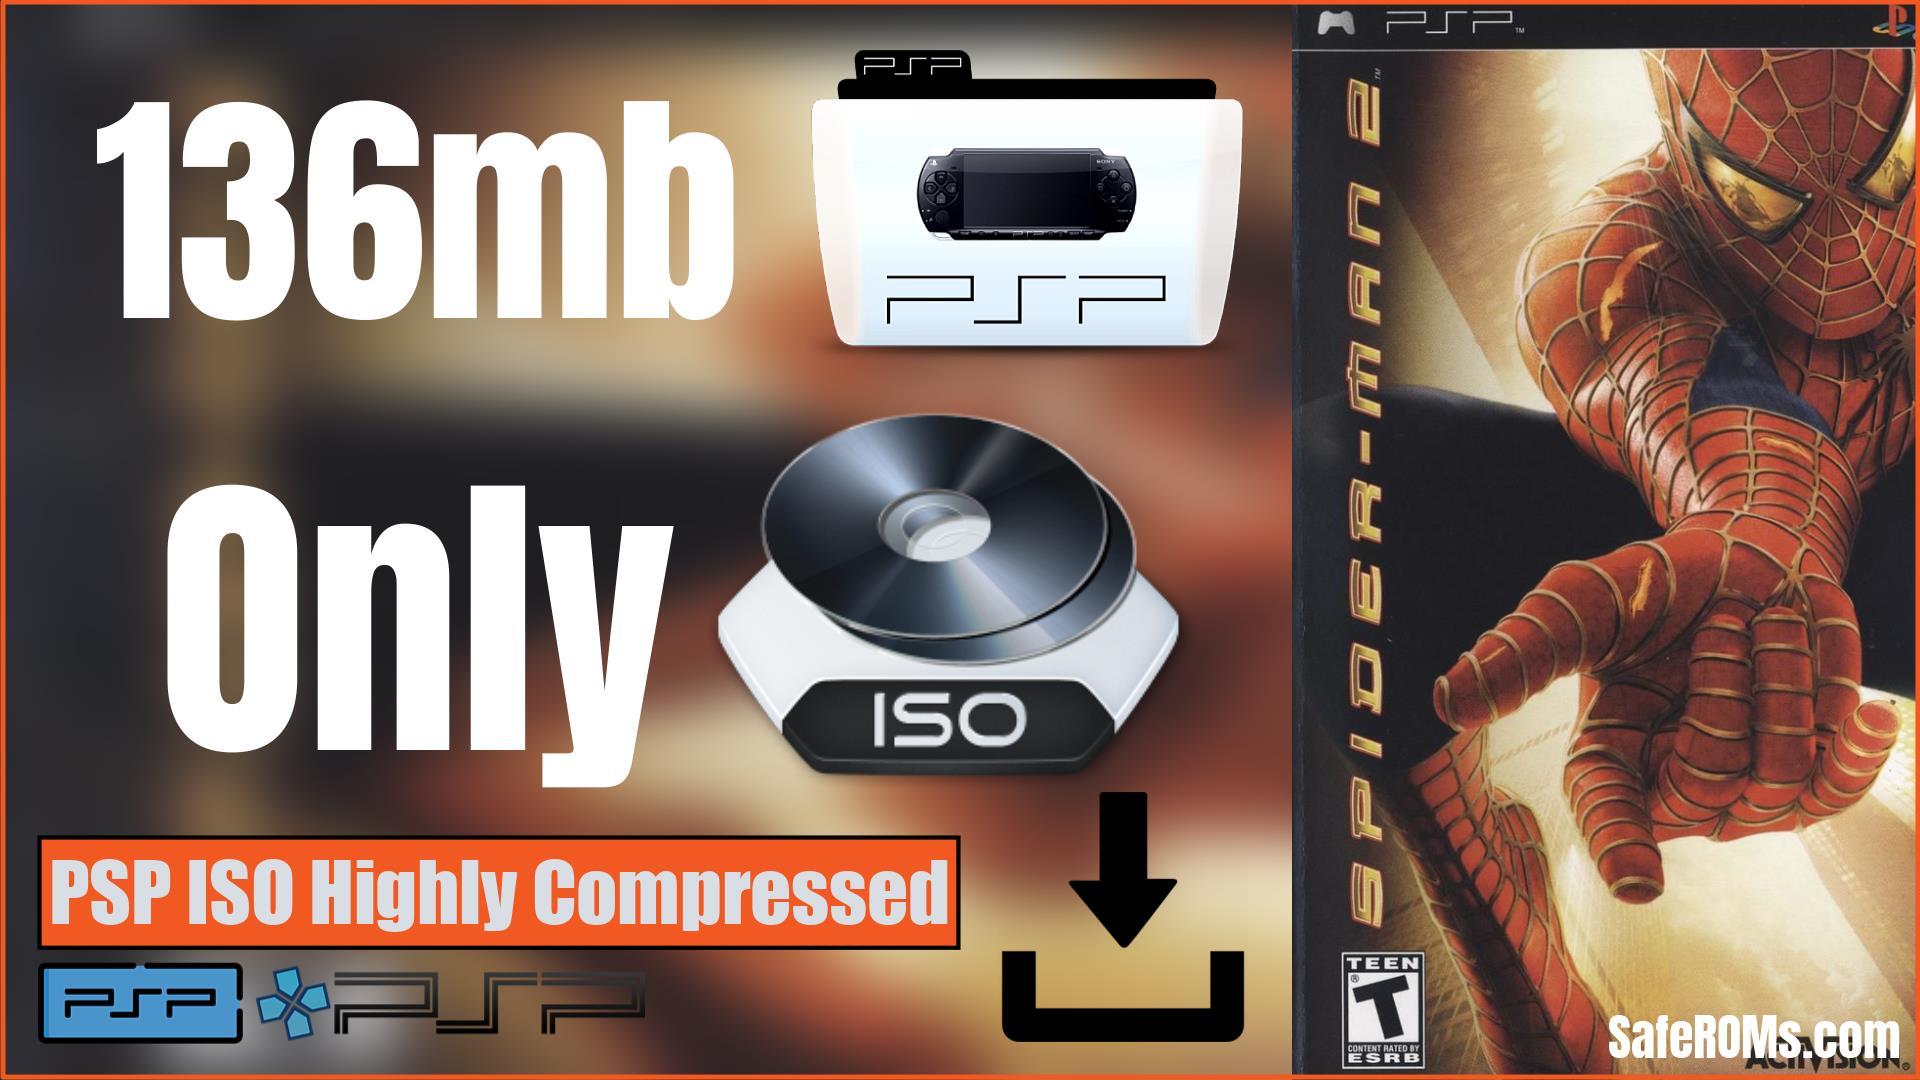 Spider-Man 2 PSP ISO Highly Compressed Download (136mb)